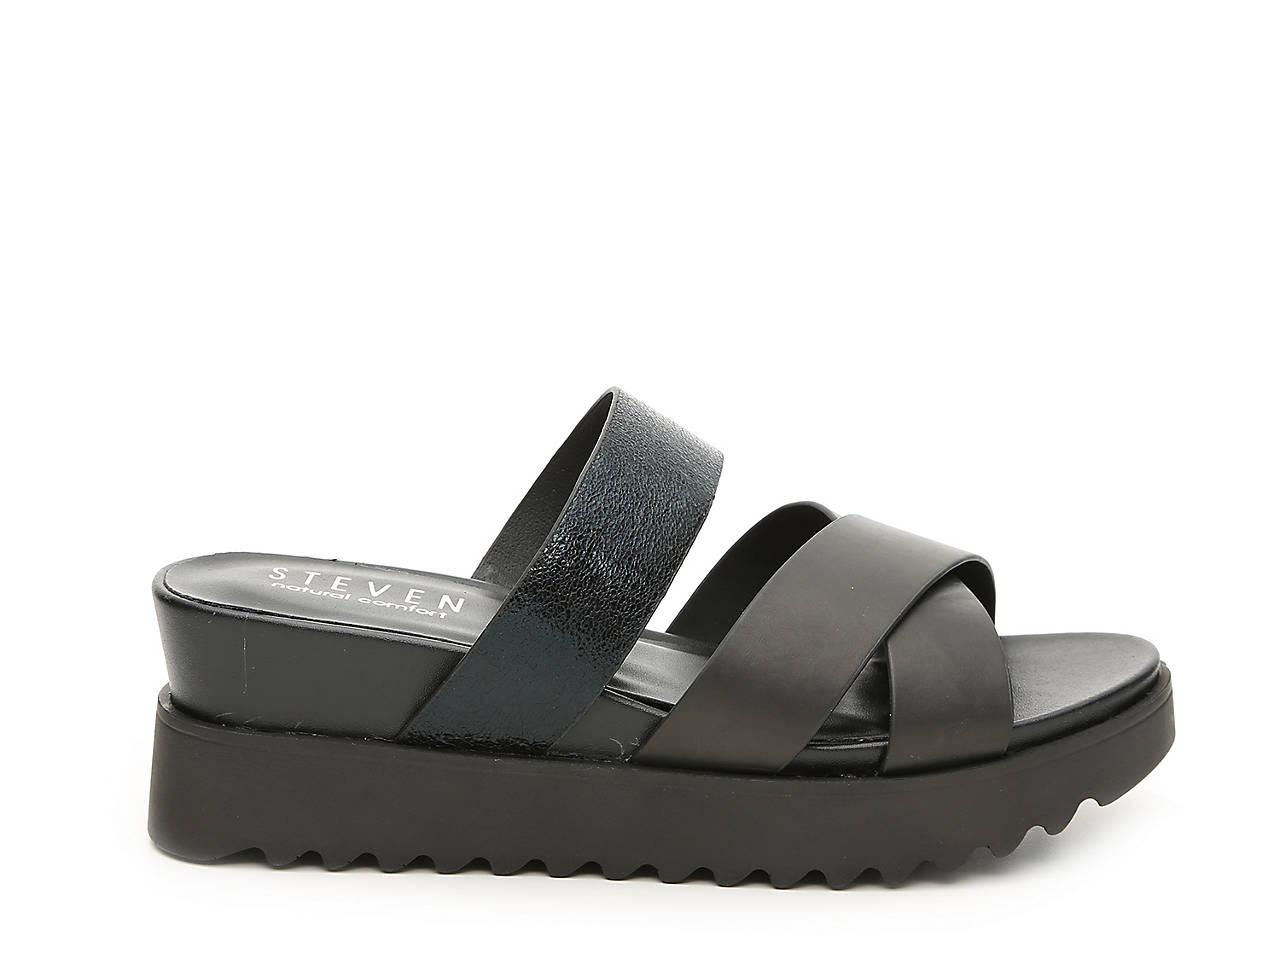 75651044258 Steven Natural Comfort Kick Wedge Sandal Women s Shoes